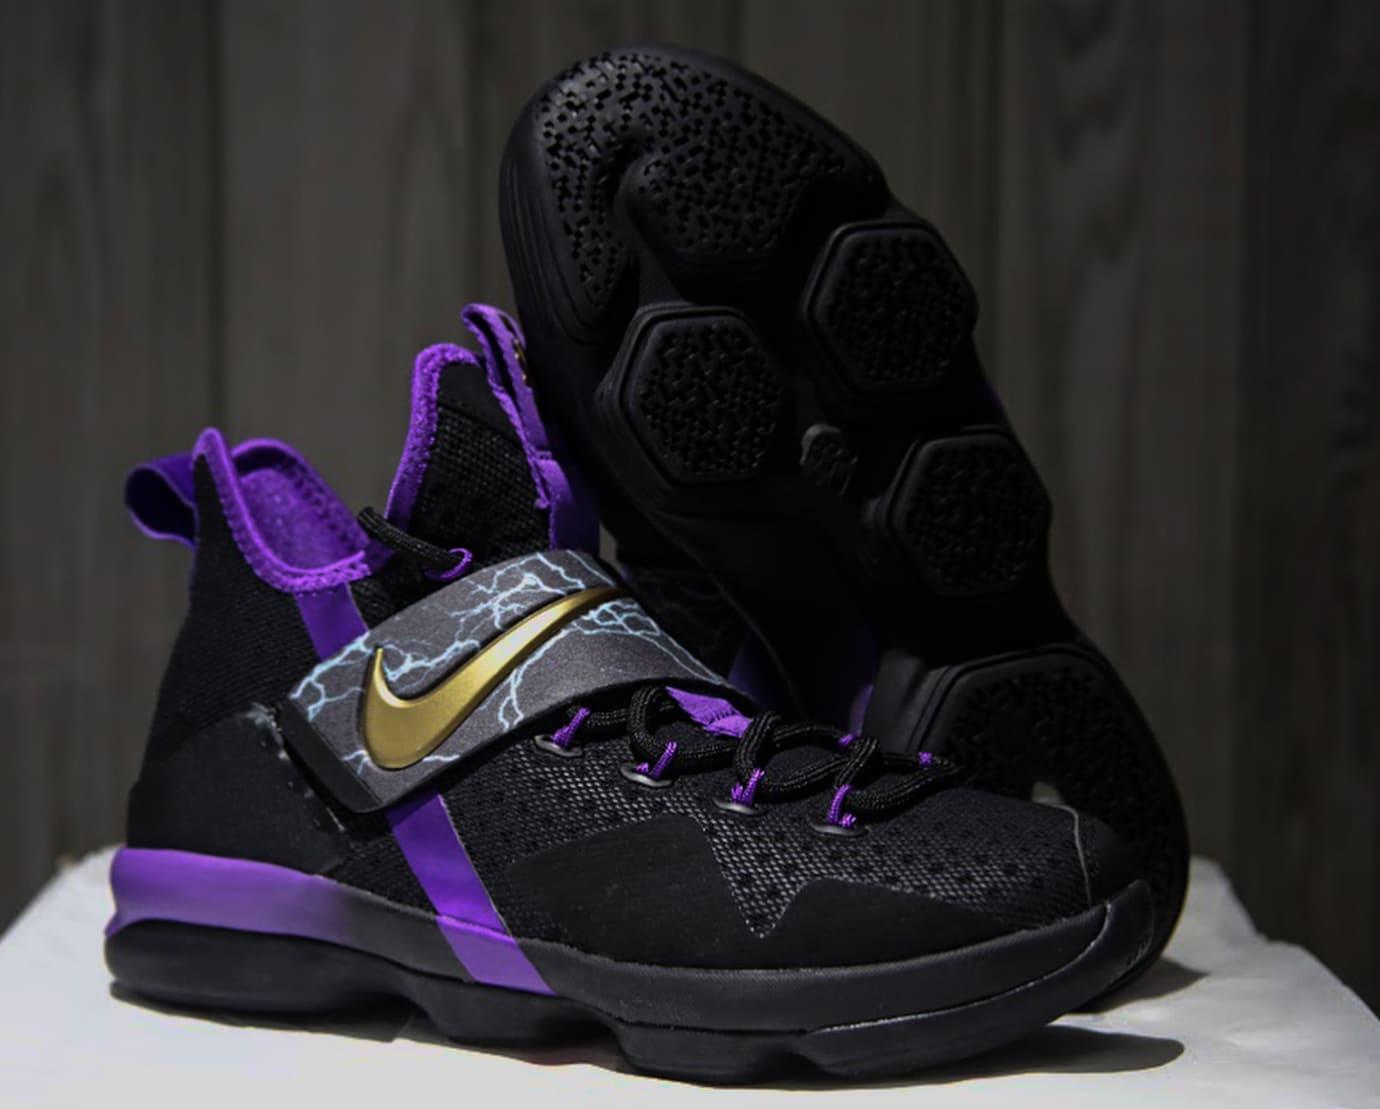 Nike LeBron 14 Black Purple Gold Release Date Profile AA3258-590